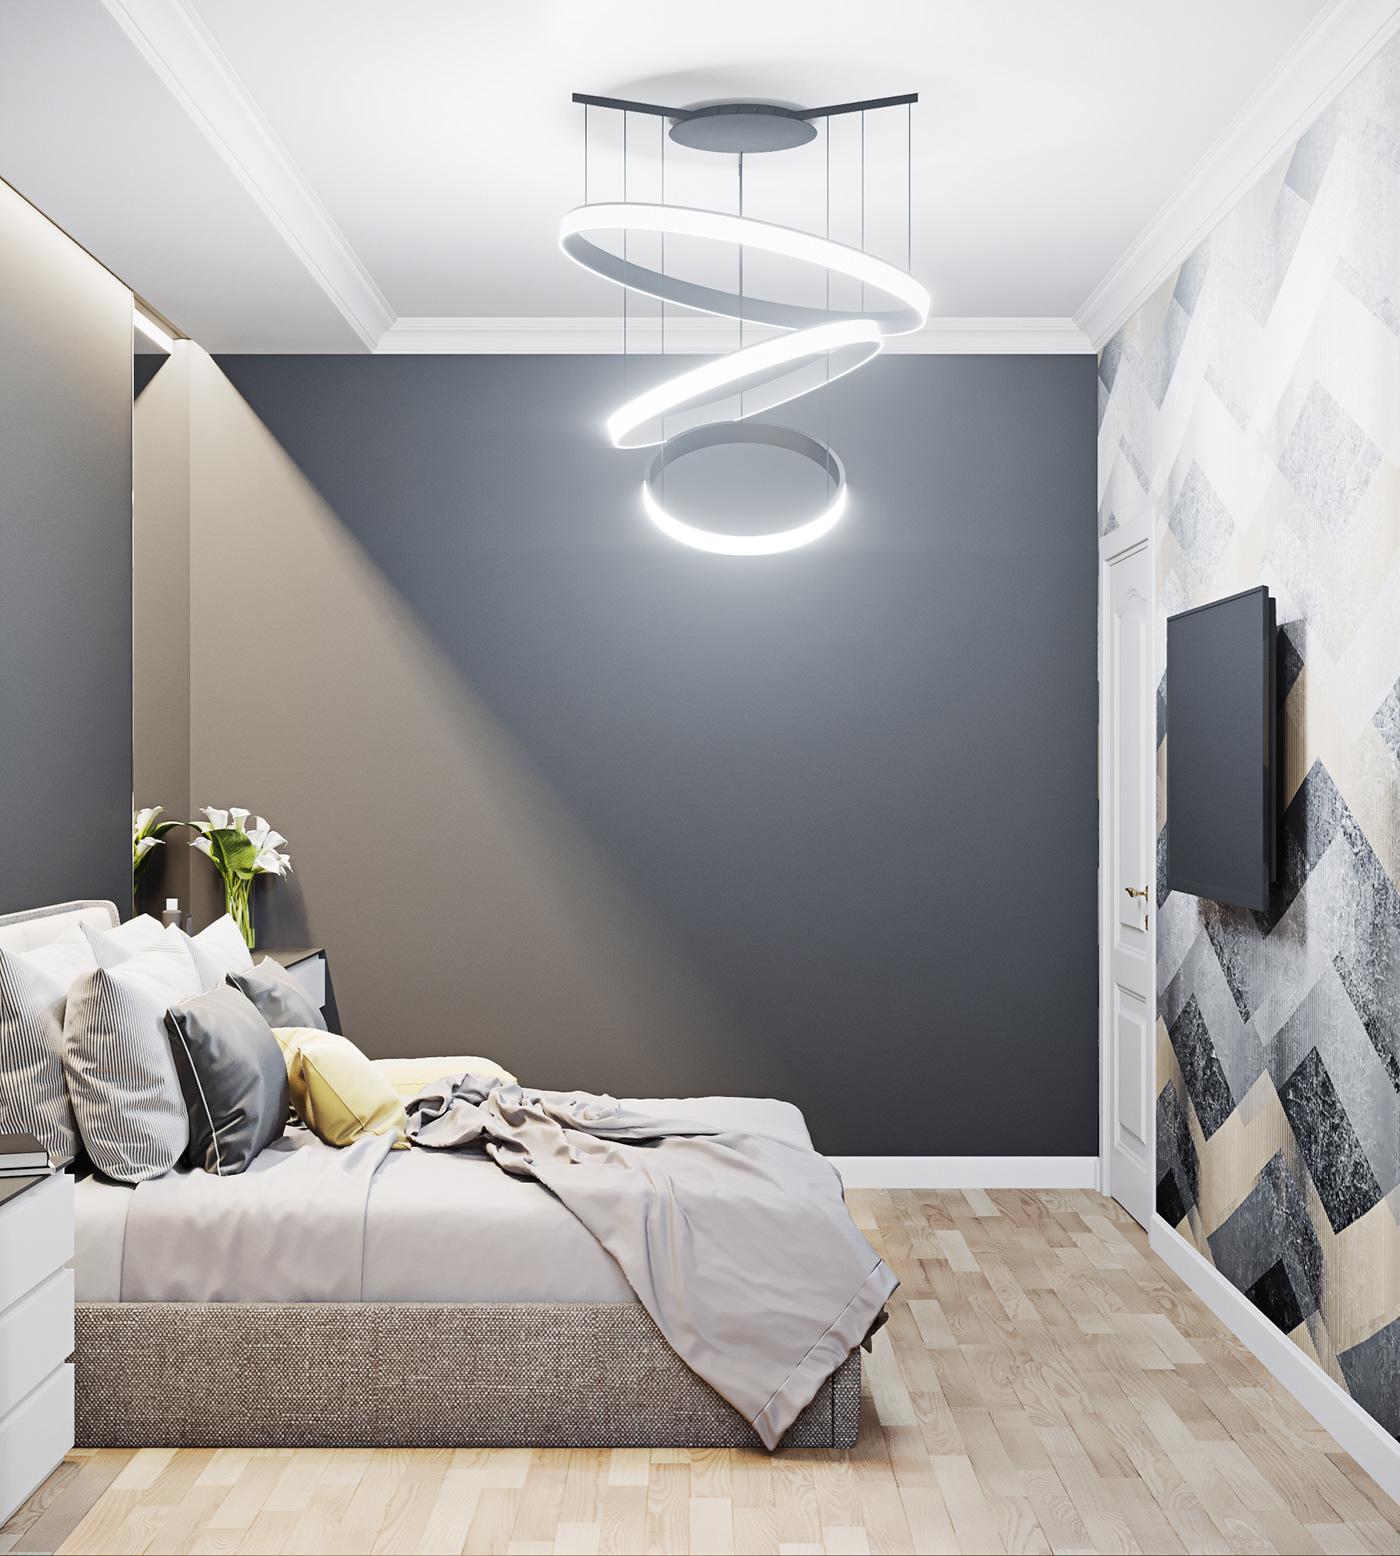 corona 3dsmax design Interior bucharest decor apartment scandinav contemporan